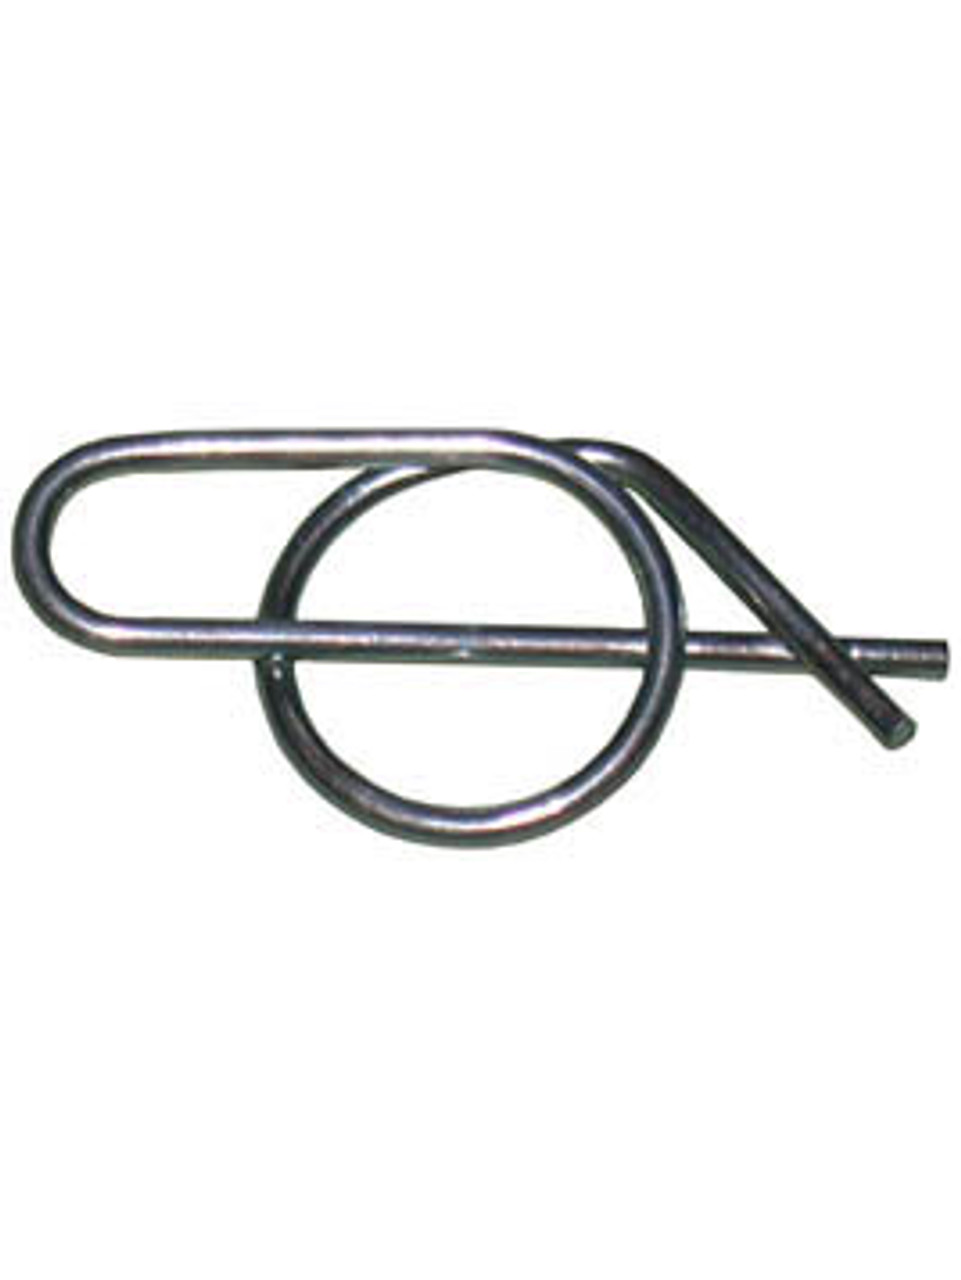 "12396 --- Demco Rue Ring Lock Cotter Pin - 5/8"""